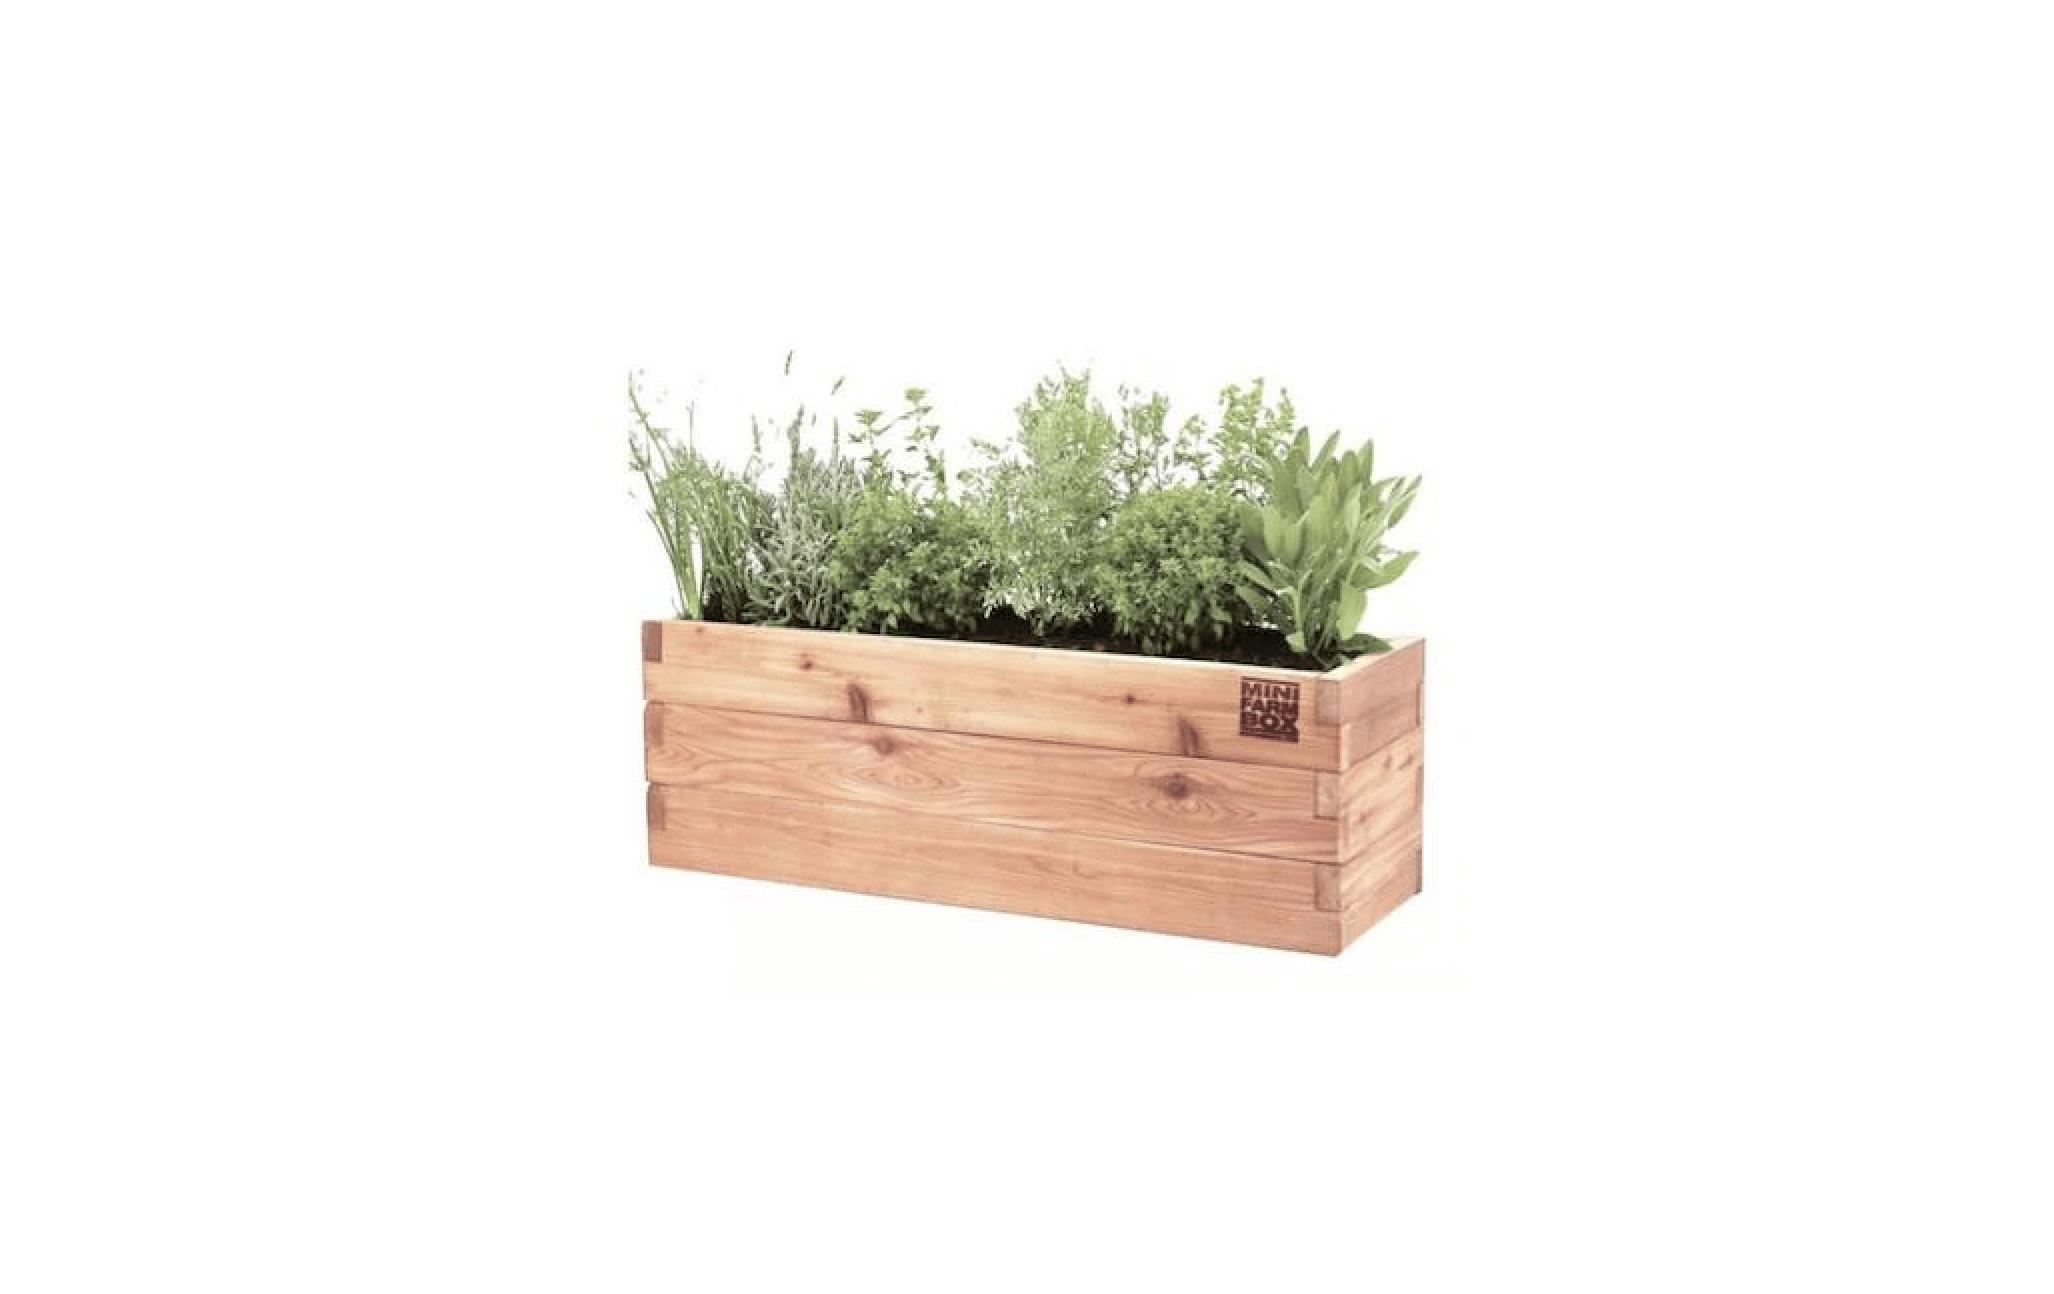 10 easy pieces: wooden window boxes - gardenista